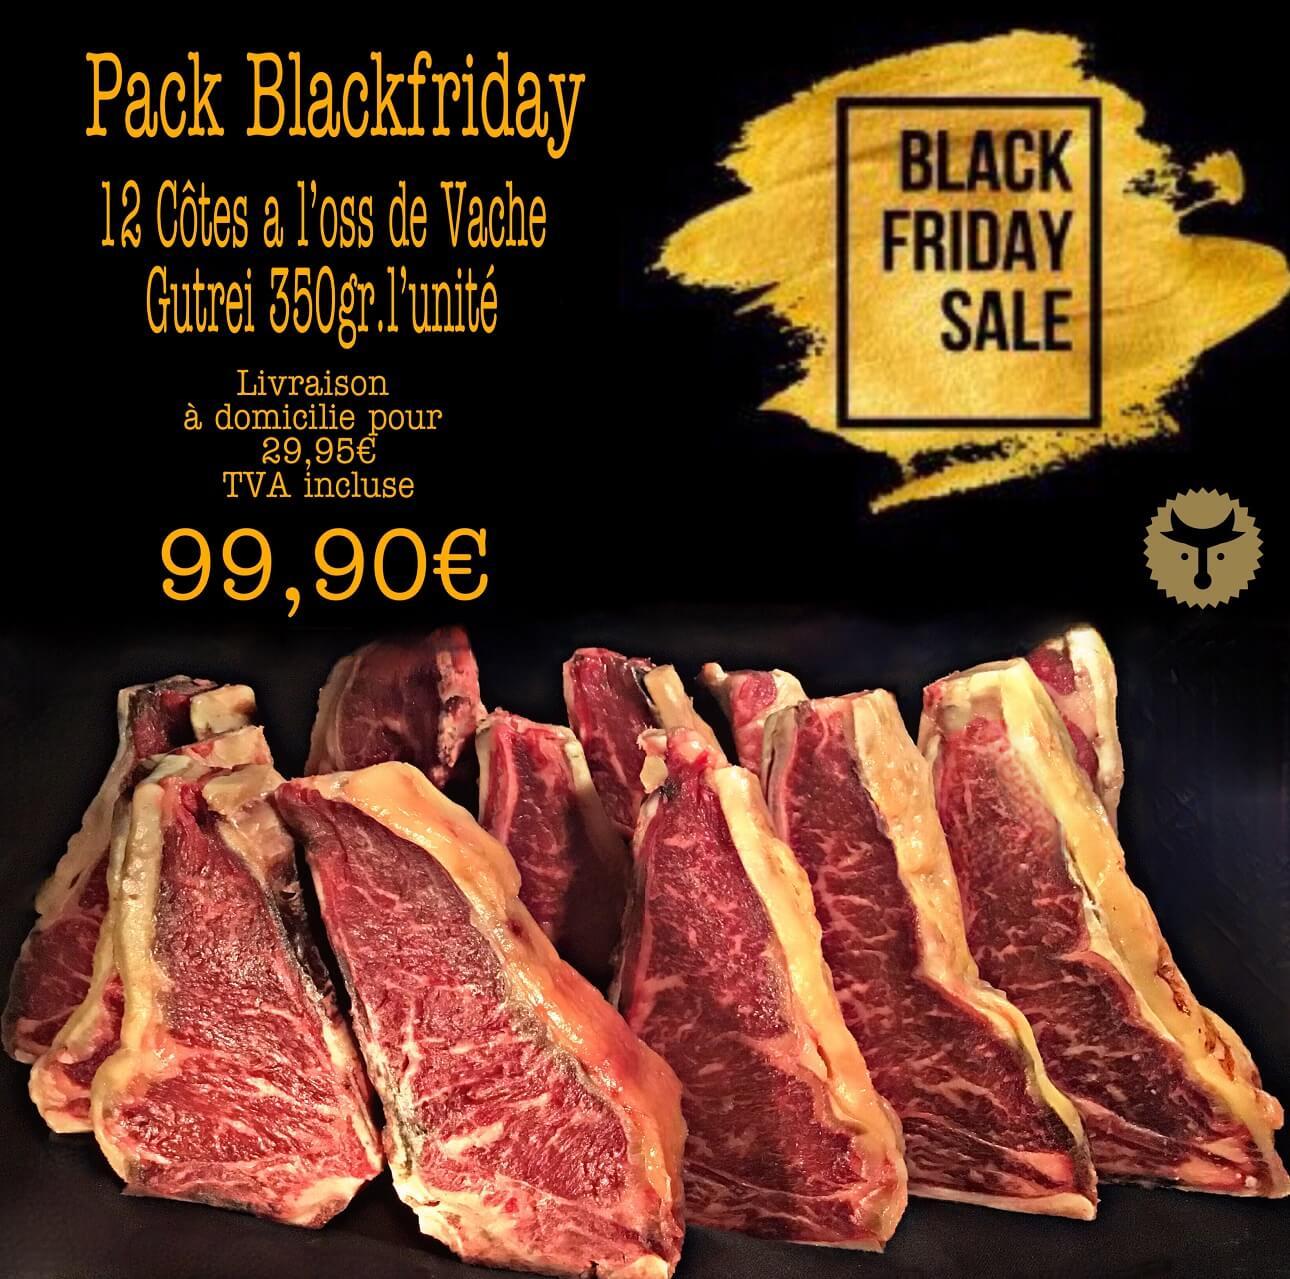 Pack BlackFriday: 12 côtes a l'oss de vache